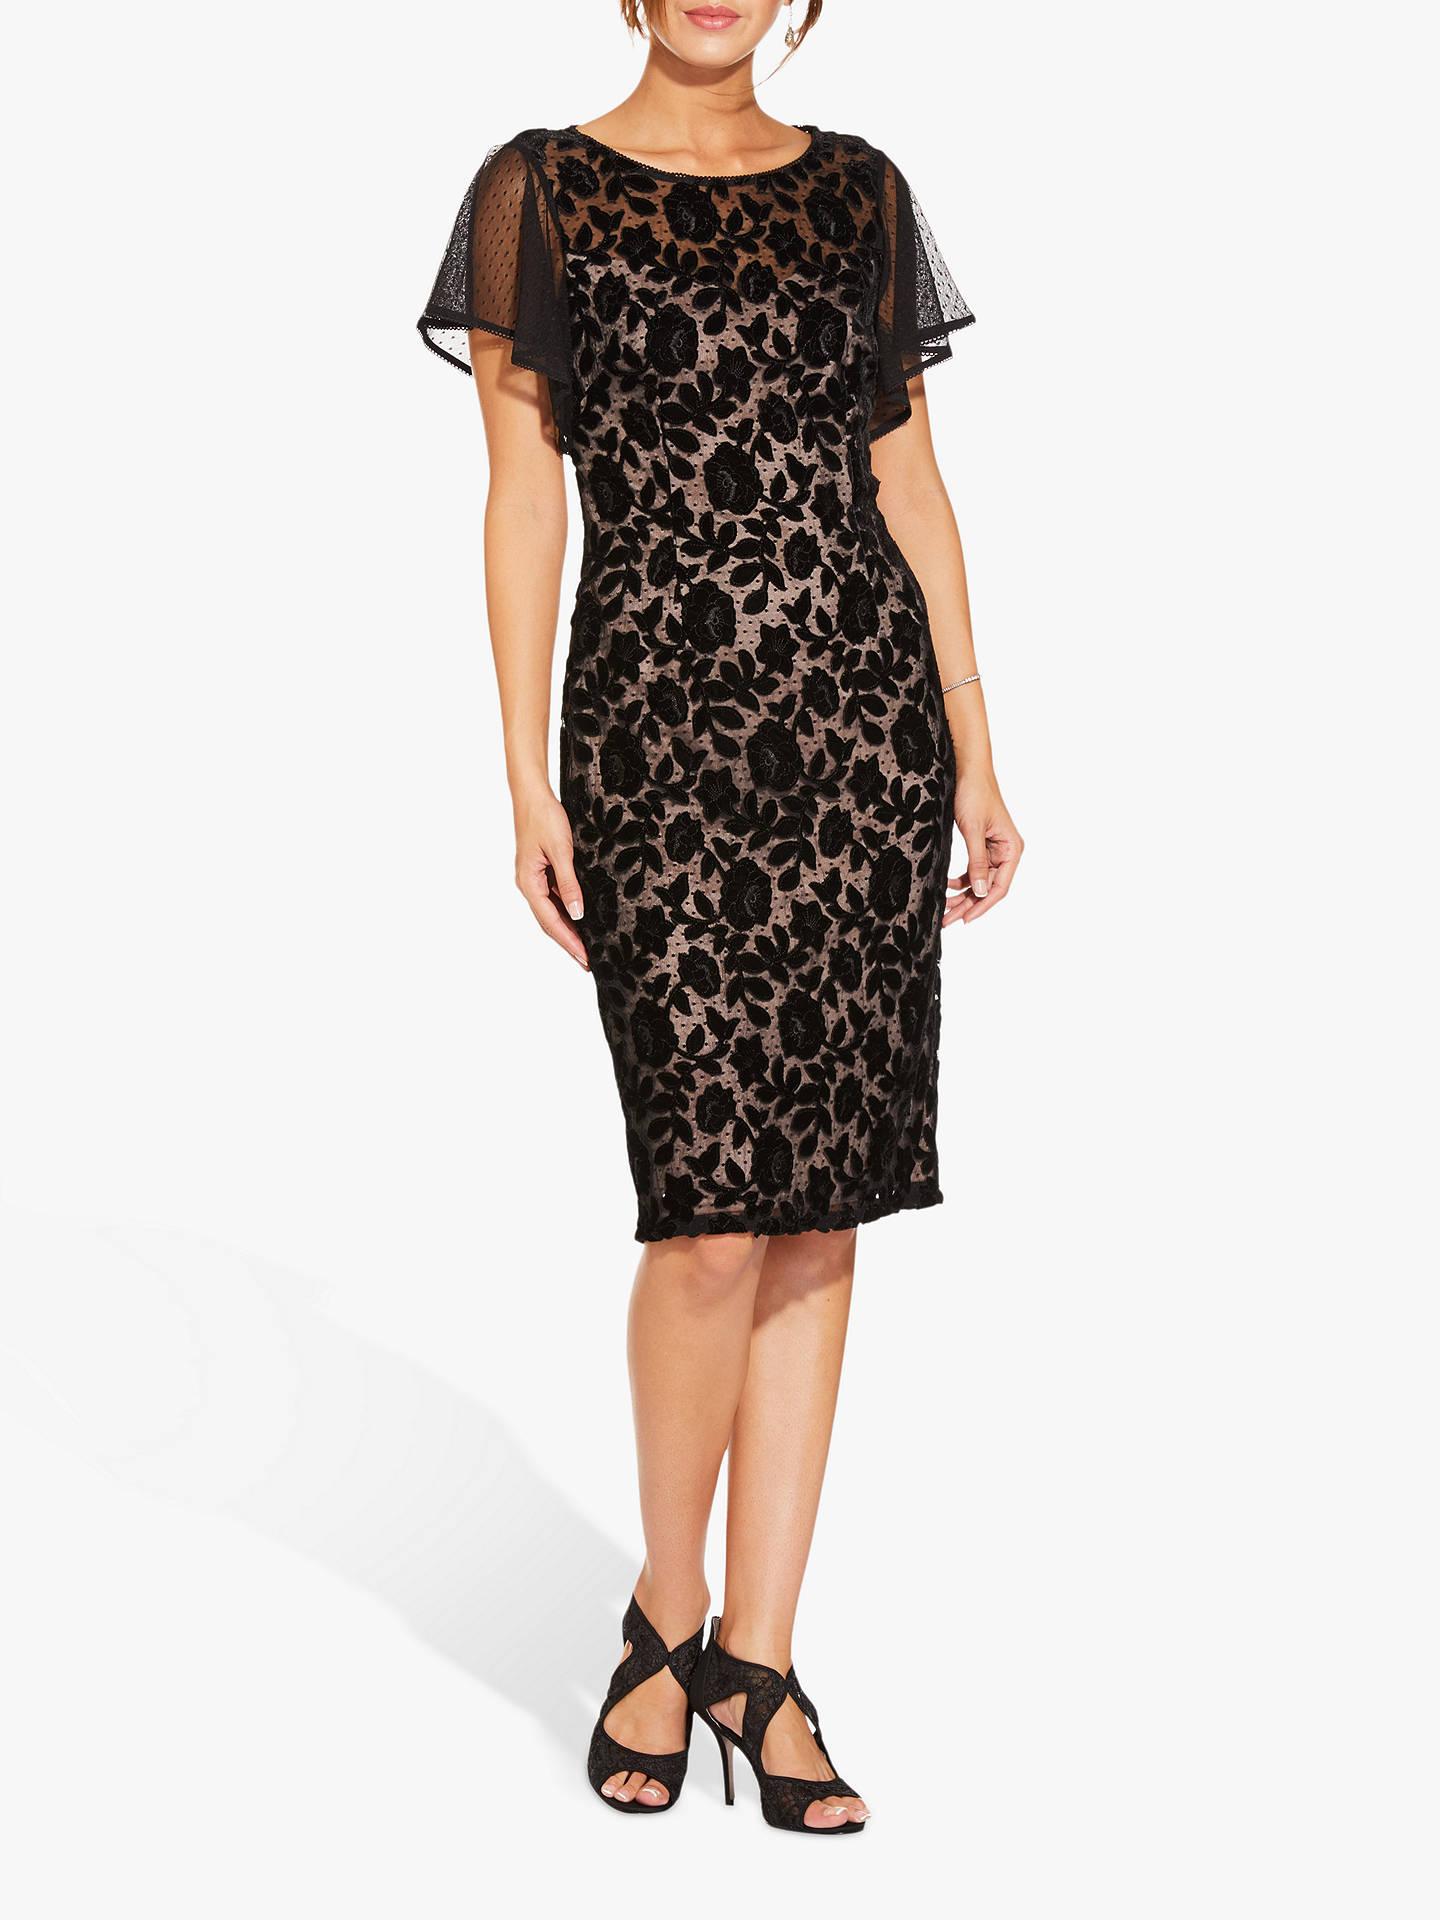 e085e68a8c52c Adrianna Papell Floral Velvet Dress, Black/Rose Gold